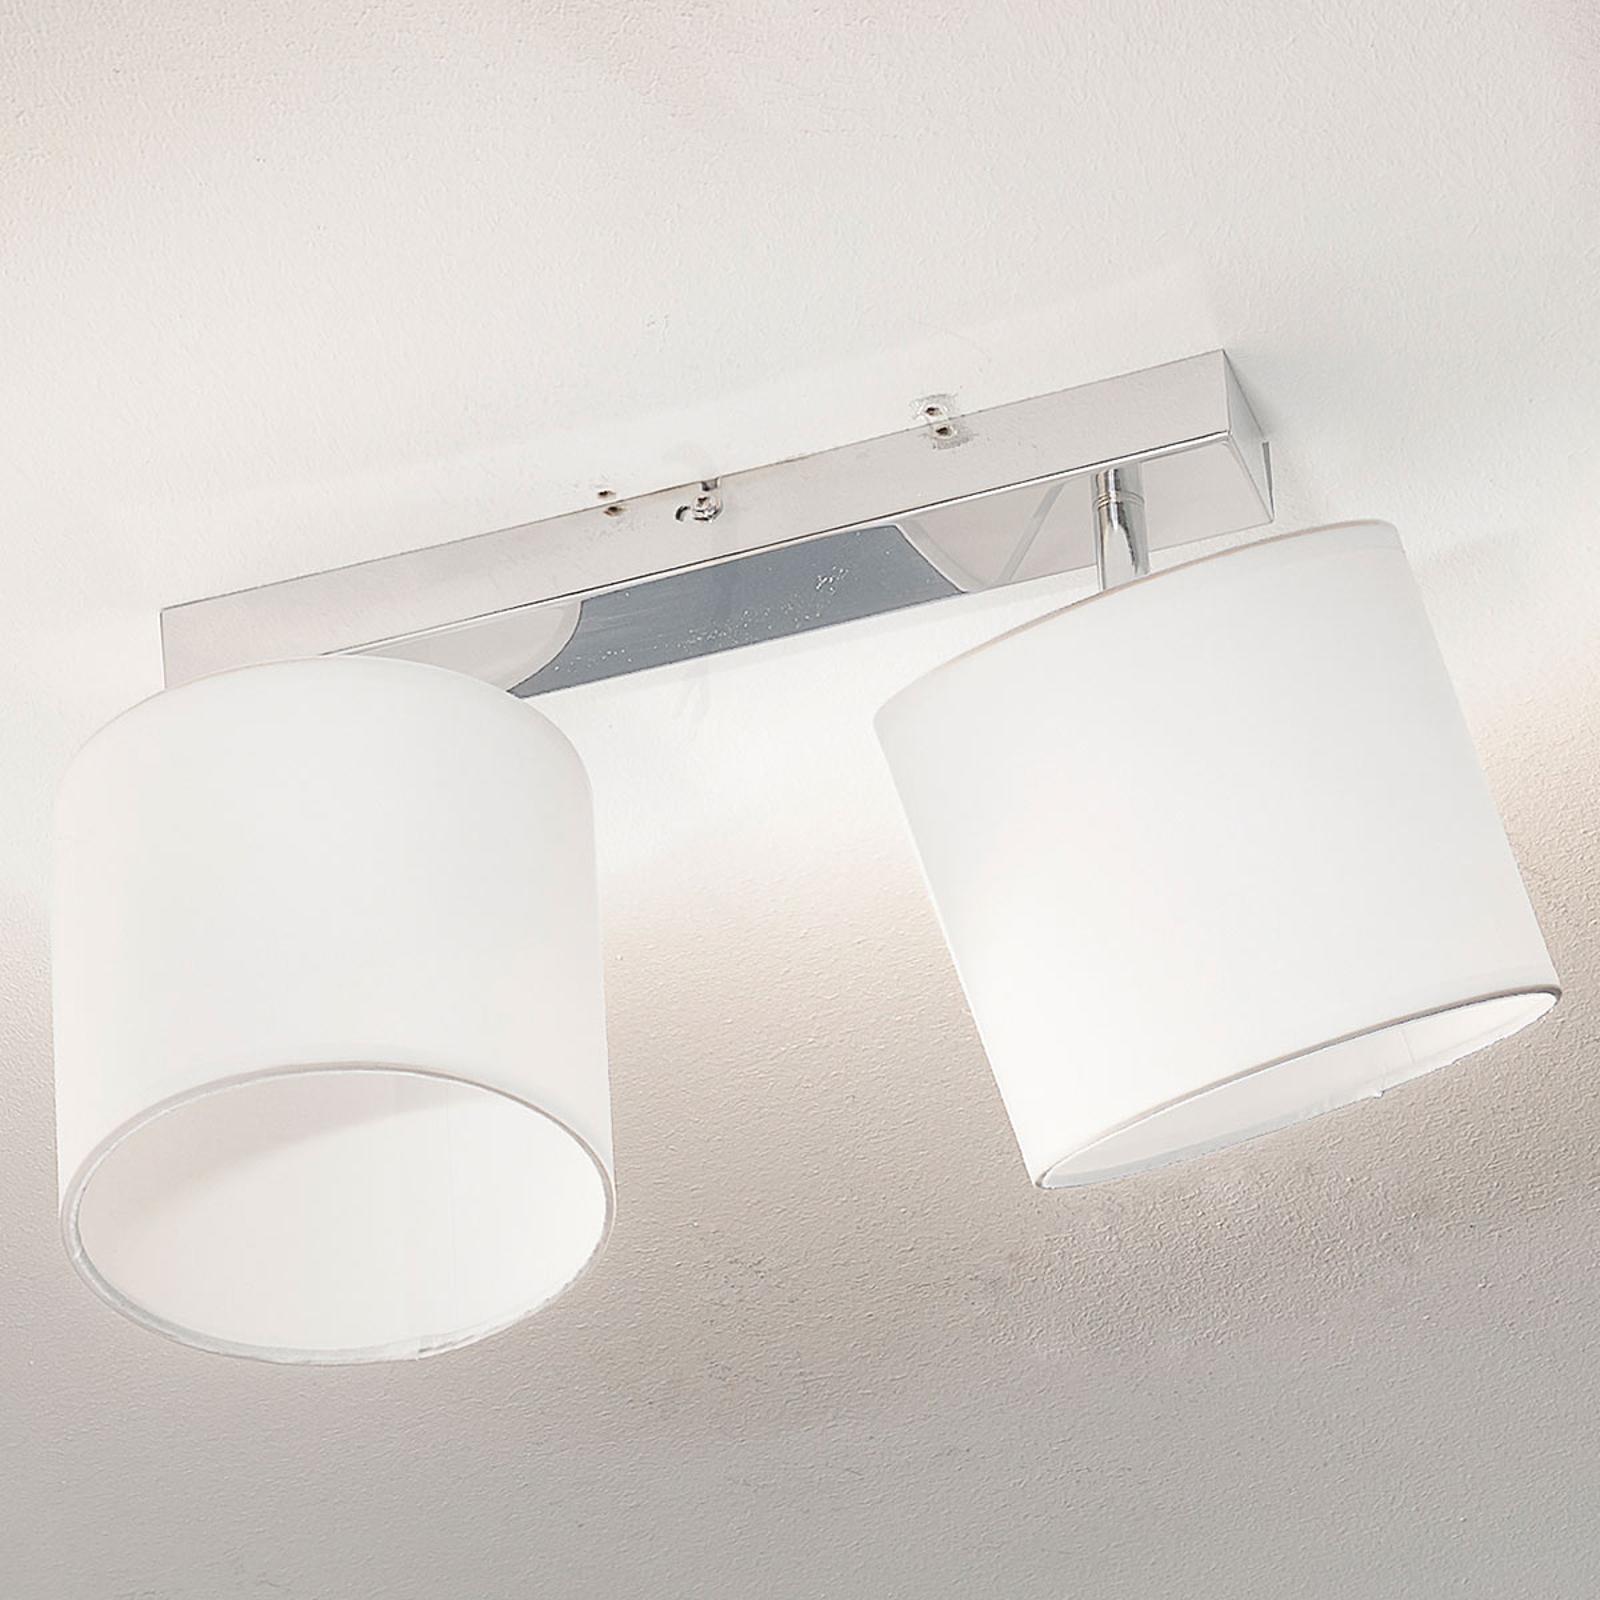 Appealing ceiling light Sandra, two-bulb_1508885_1